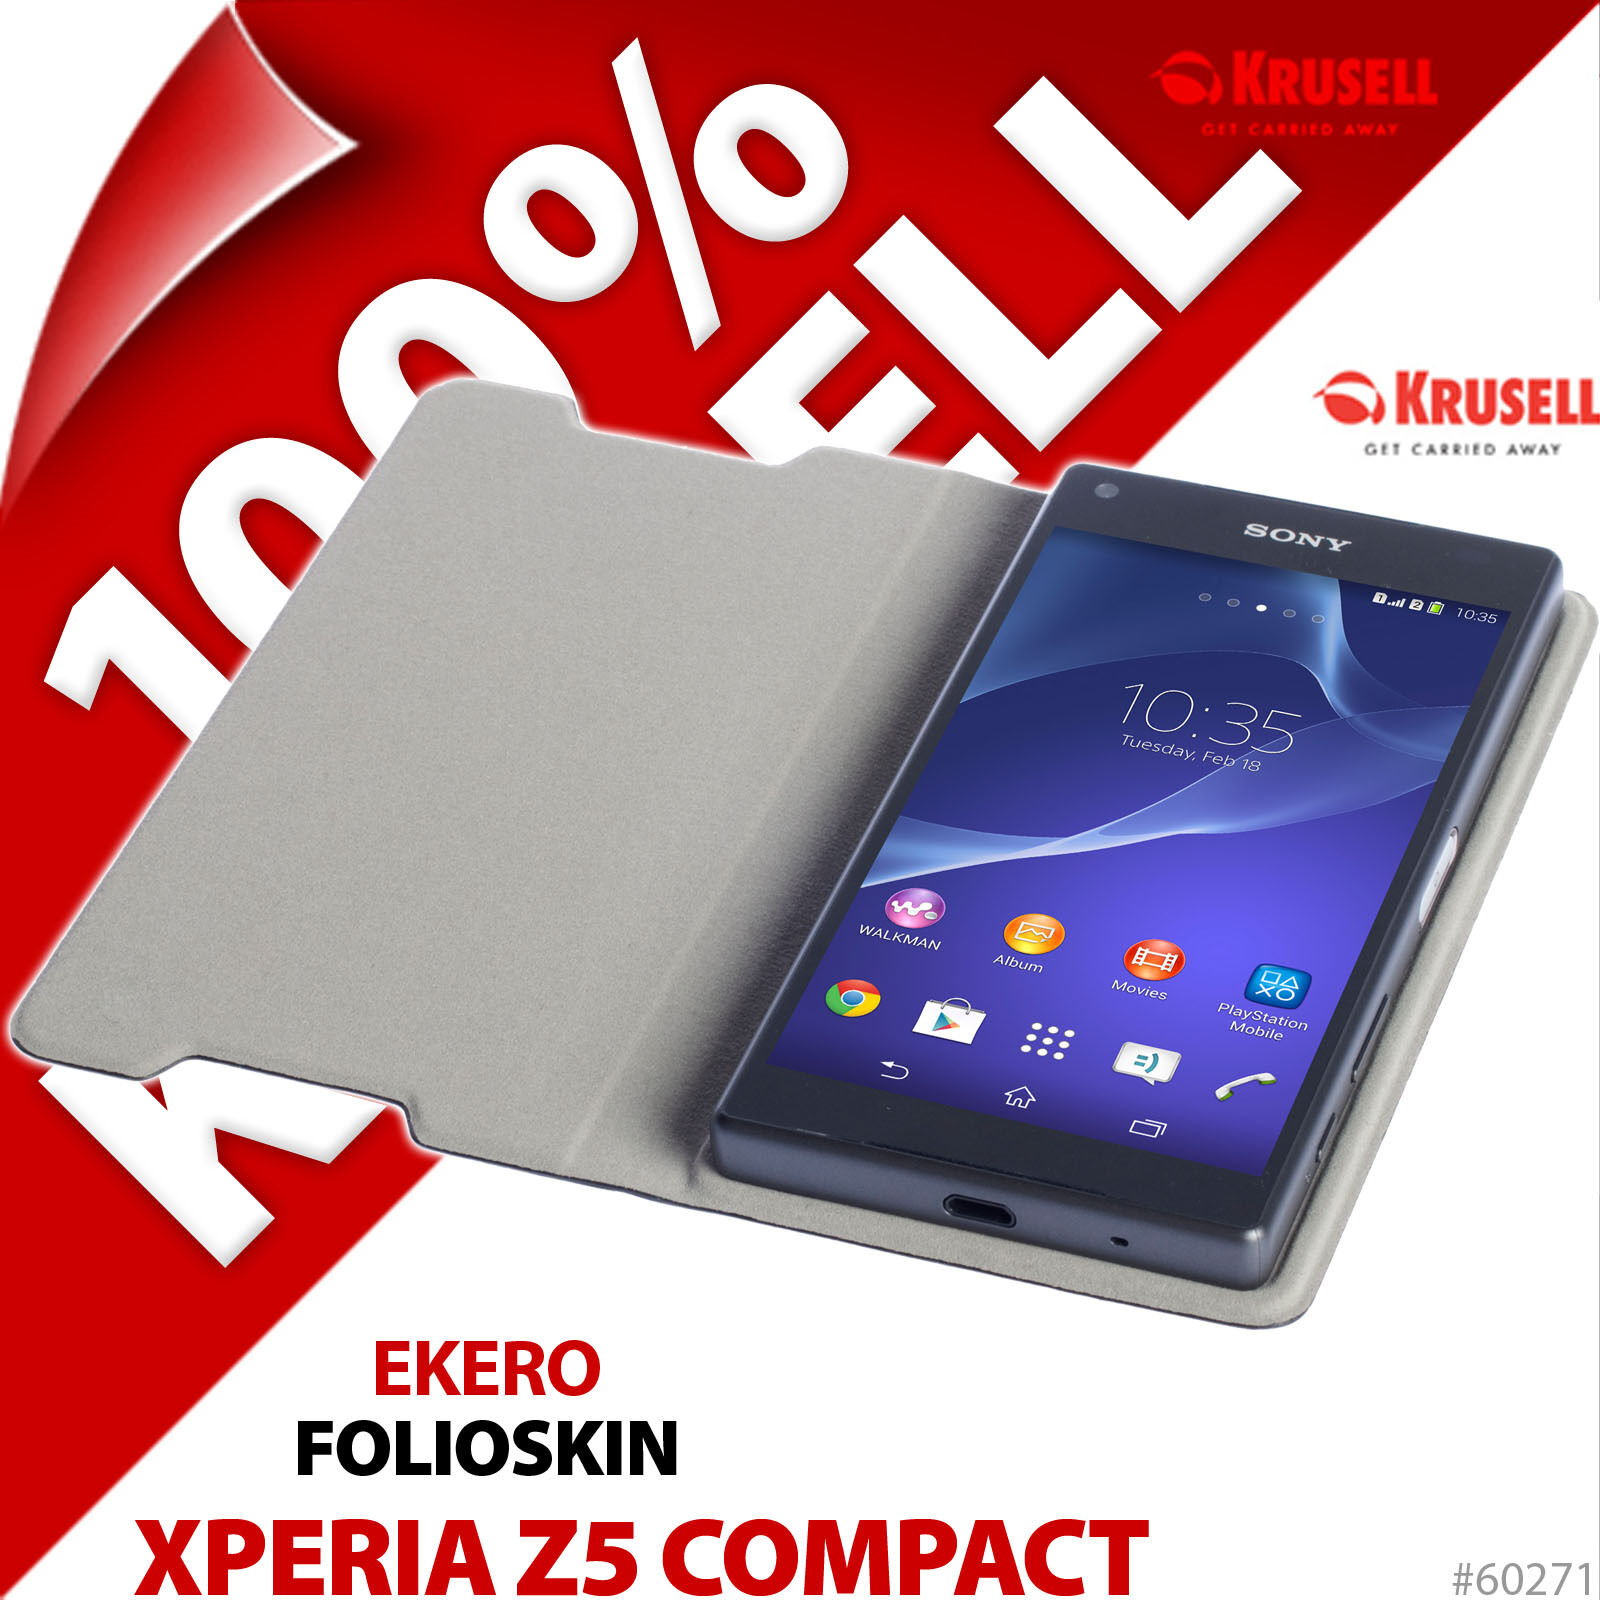 Krusell EKERO Folio Skin Cover Wallet Case Black for Sony Xperia Z5 pact